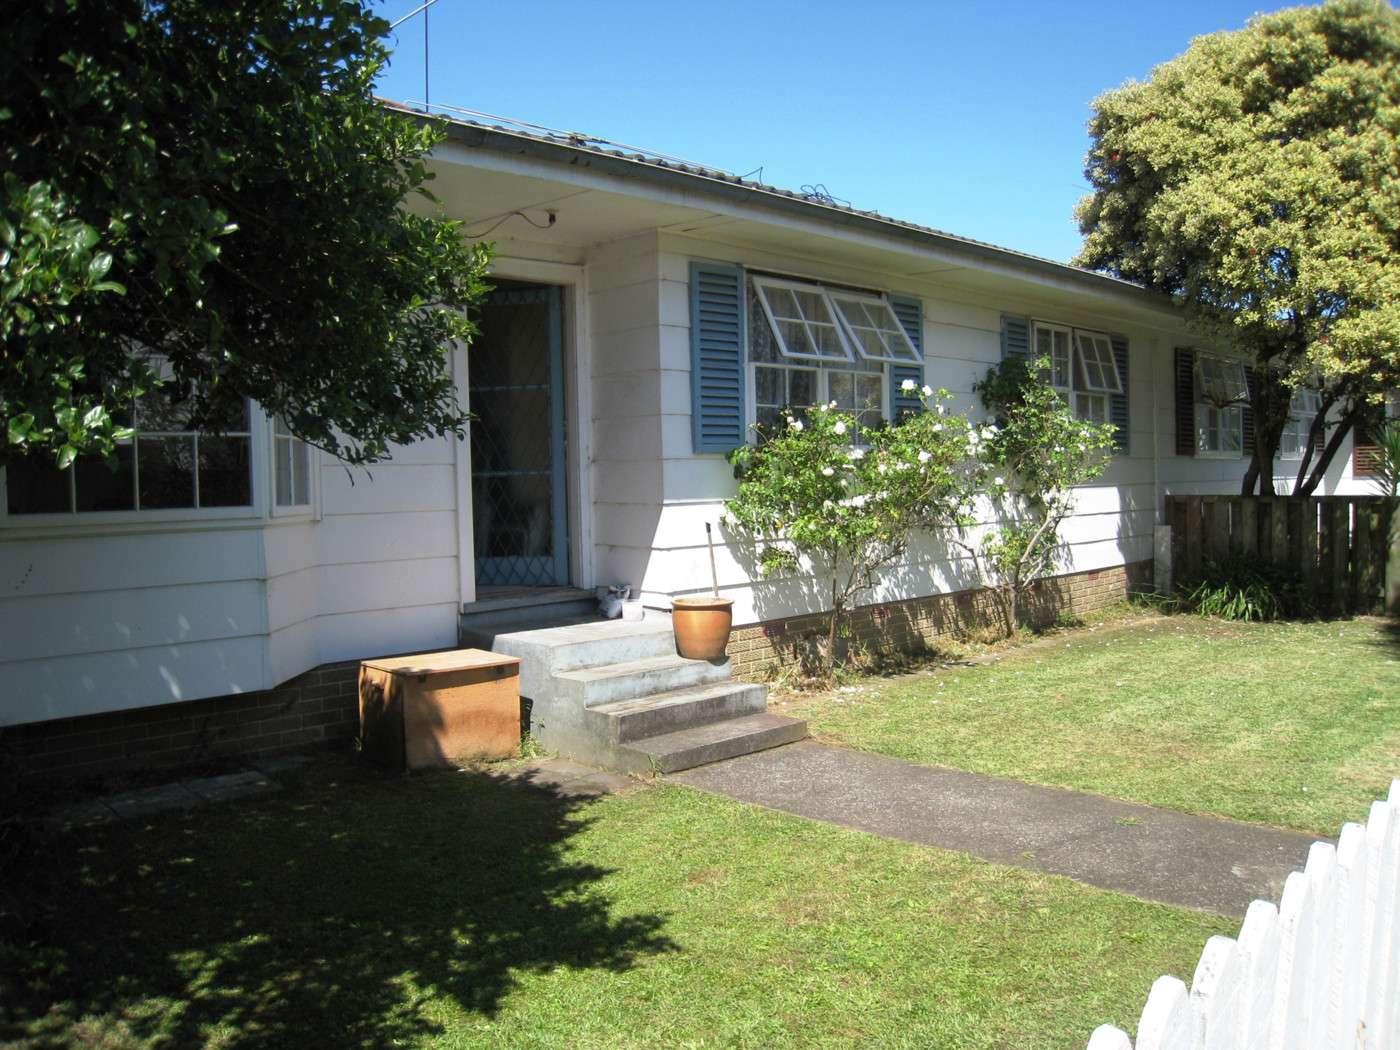 2/4 Longford Street, Mt Wellington, Auckland City 1051